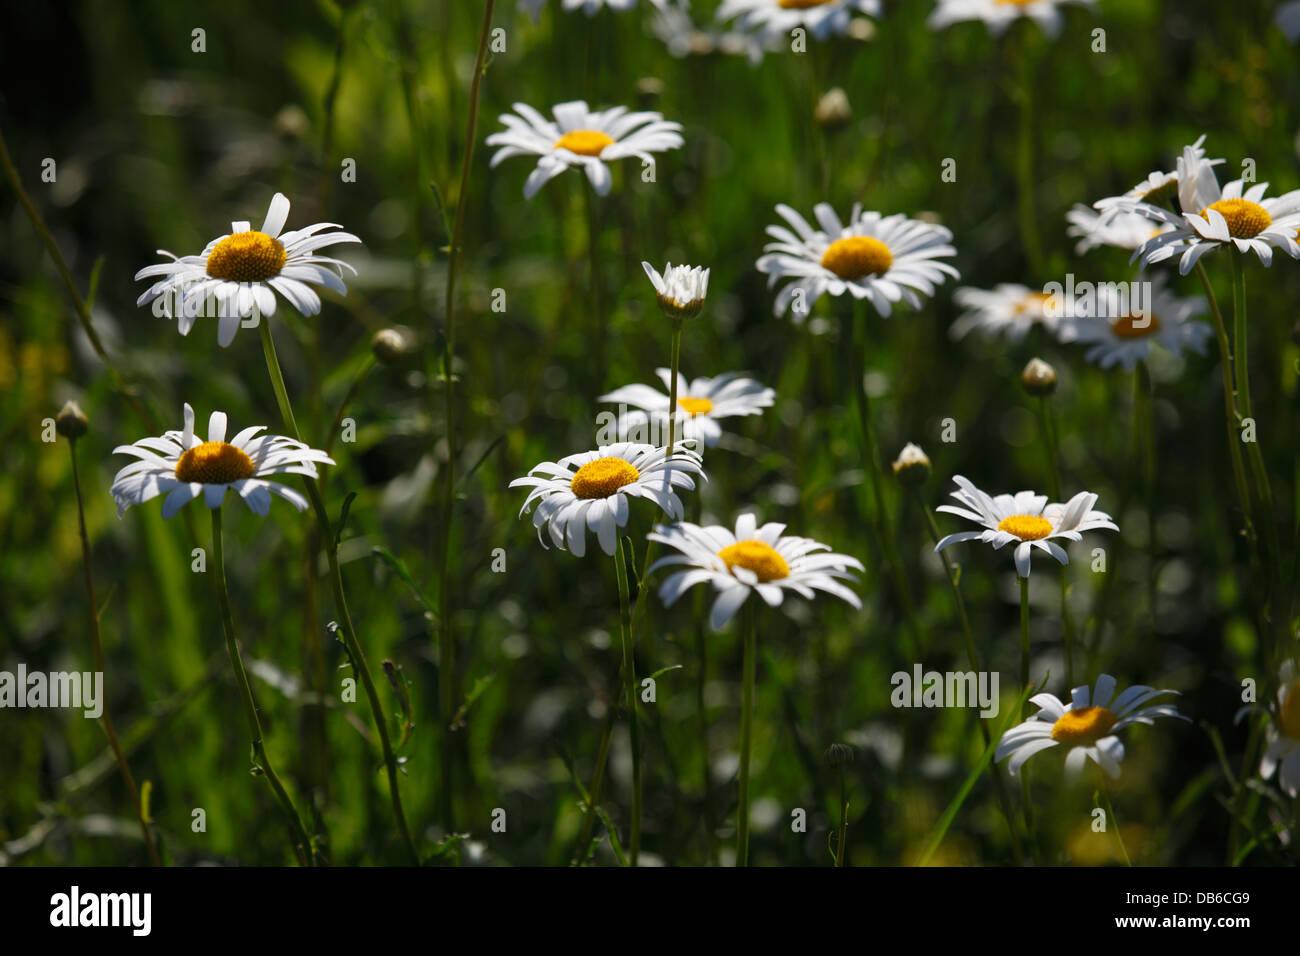 White daisy like flowers stock photos white daisy like flowers white daisy like flowers stock image izmirmasajfo